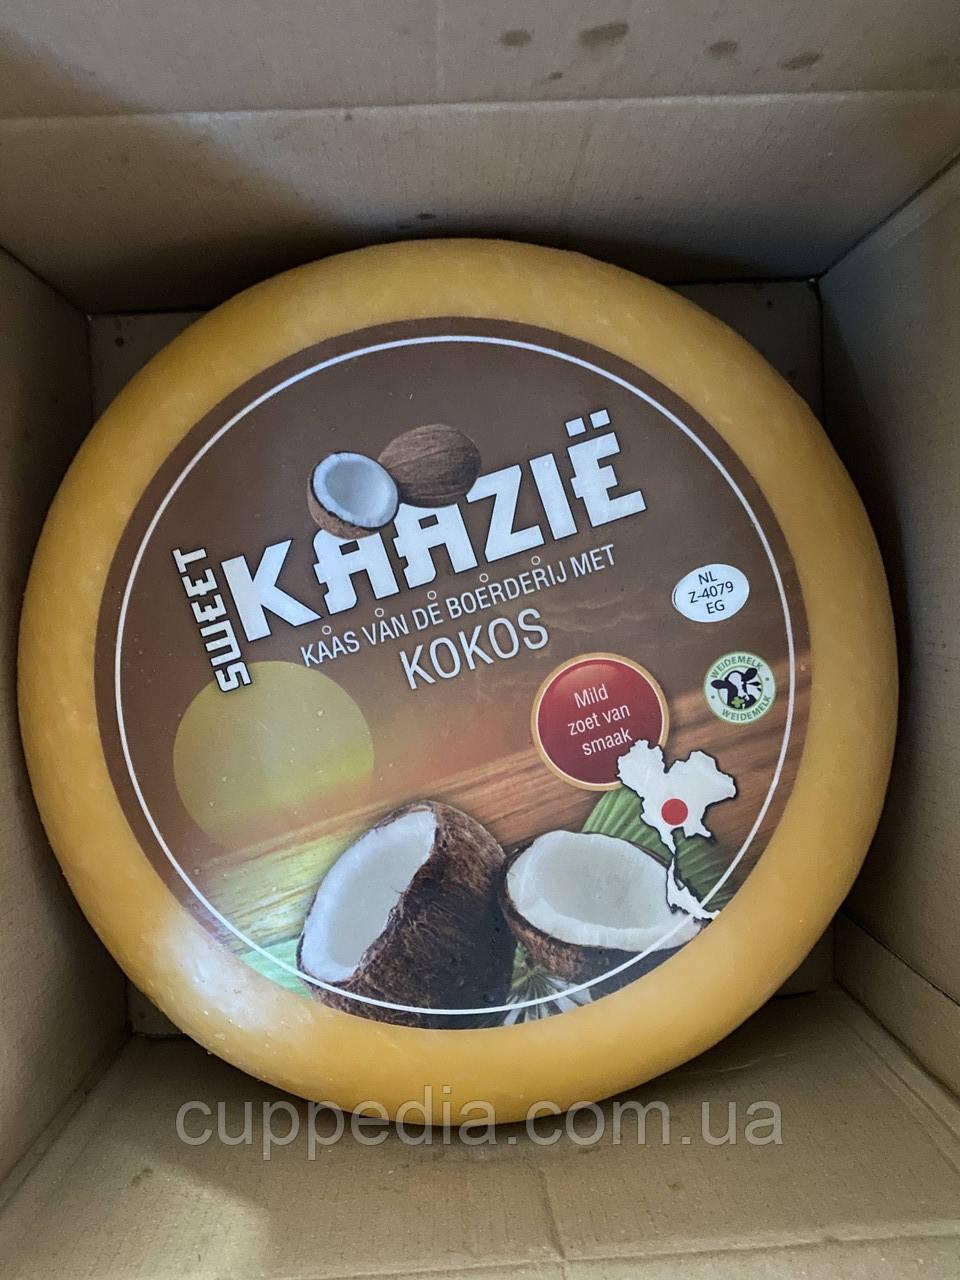 Сир Sweet kaazie kokos з кокосом (шматочки сиру 200-300 грм)